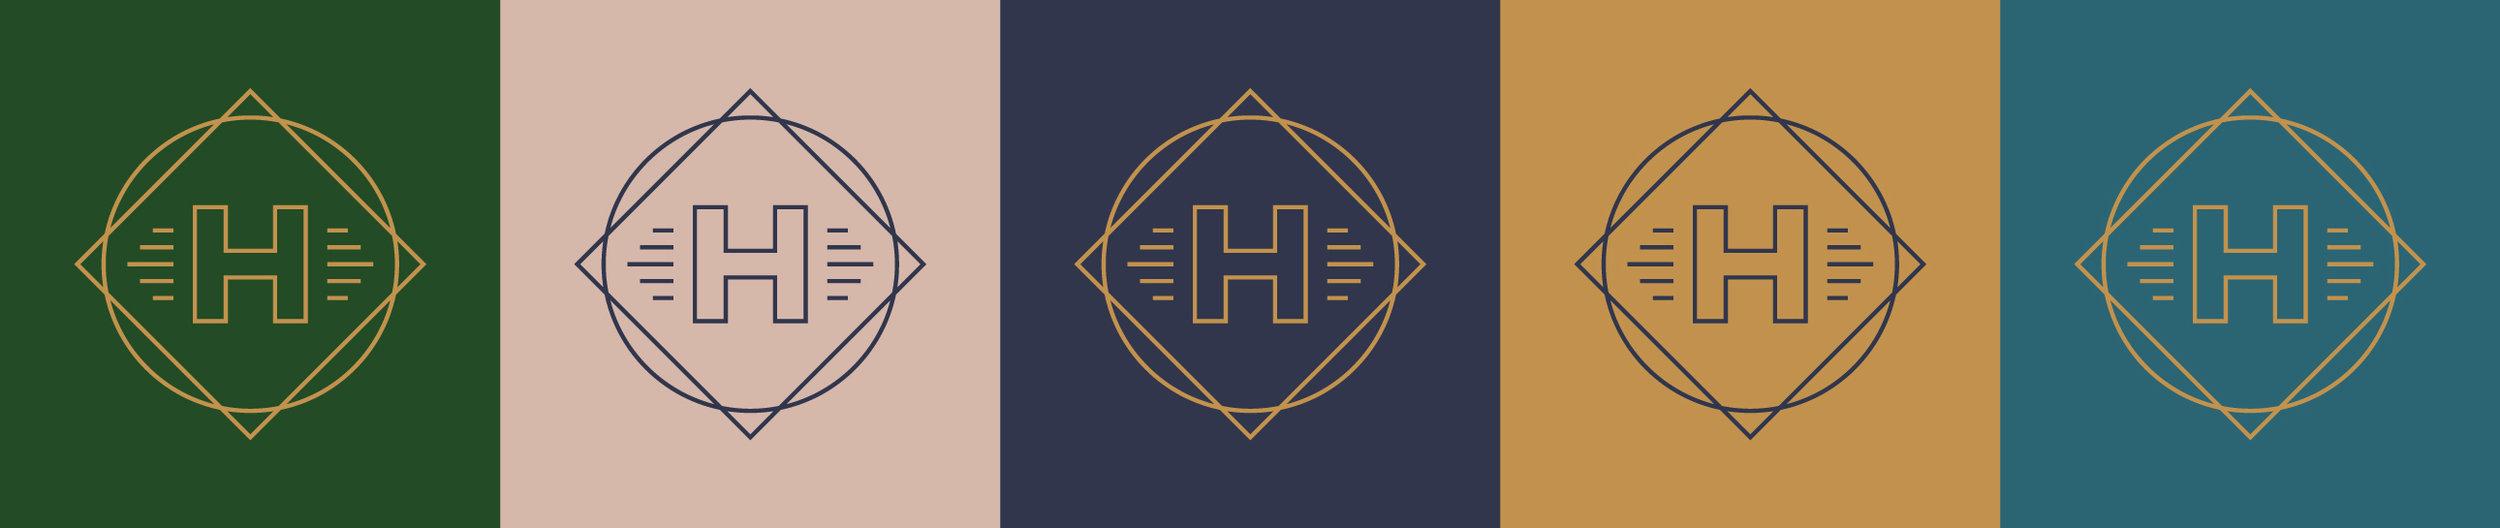 HH_HeaderLogoMark3.jpg